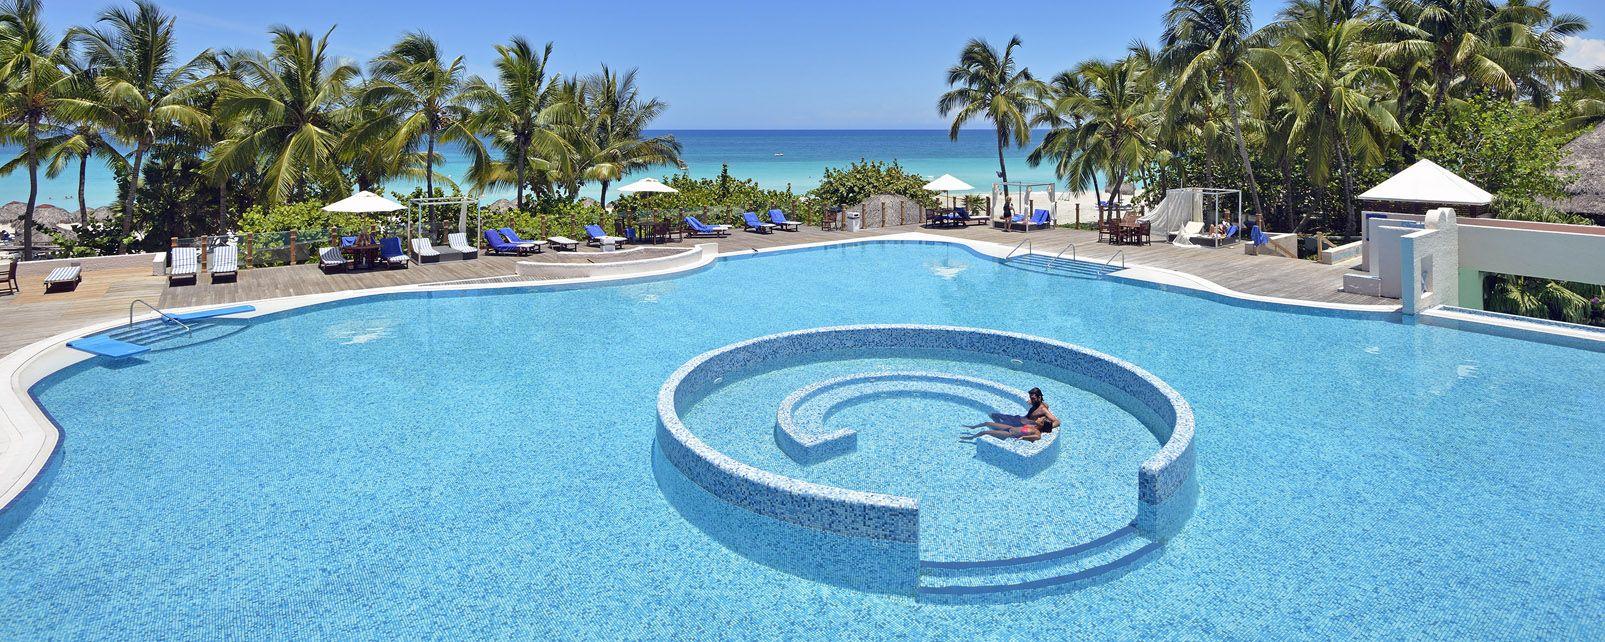 Hotel Melia Las Americas Varadero